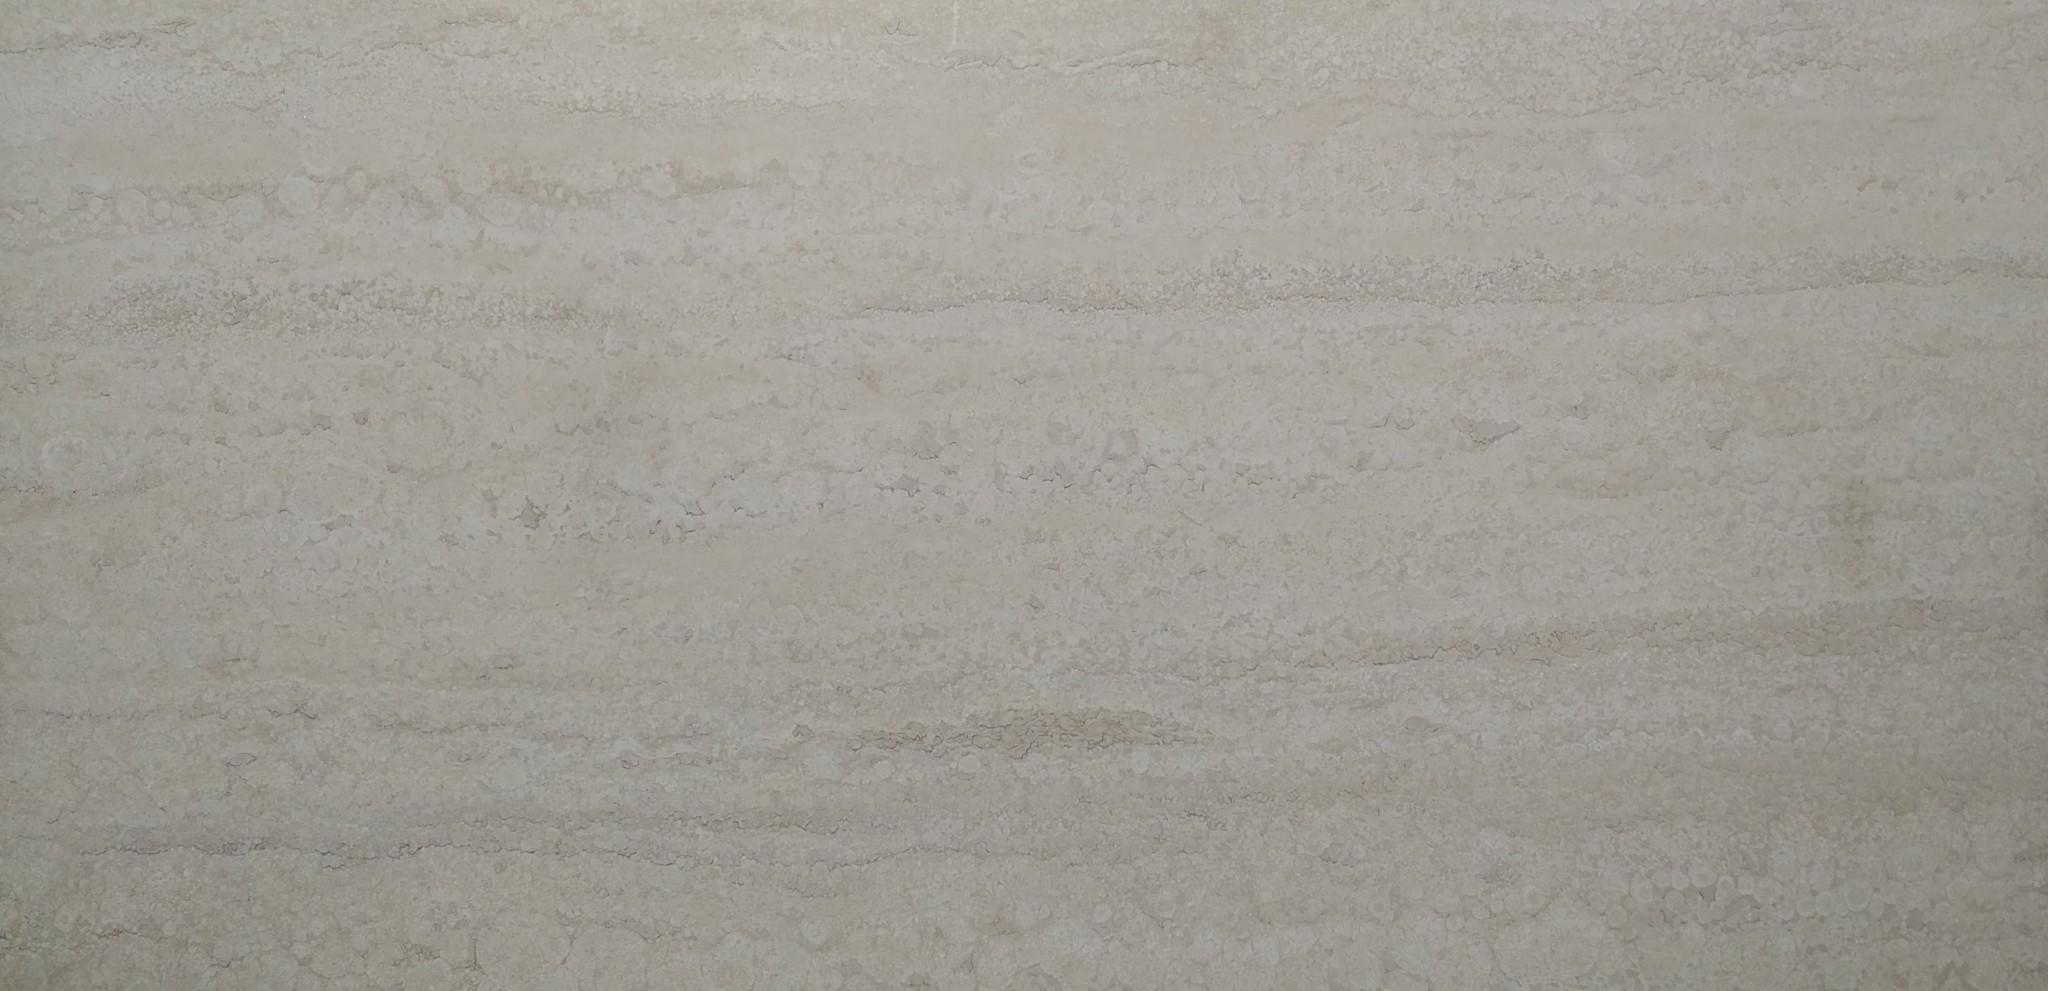 tile floor marble flooring adhesive bathroom itm vinyl tiles stone self kitchen